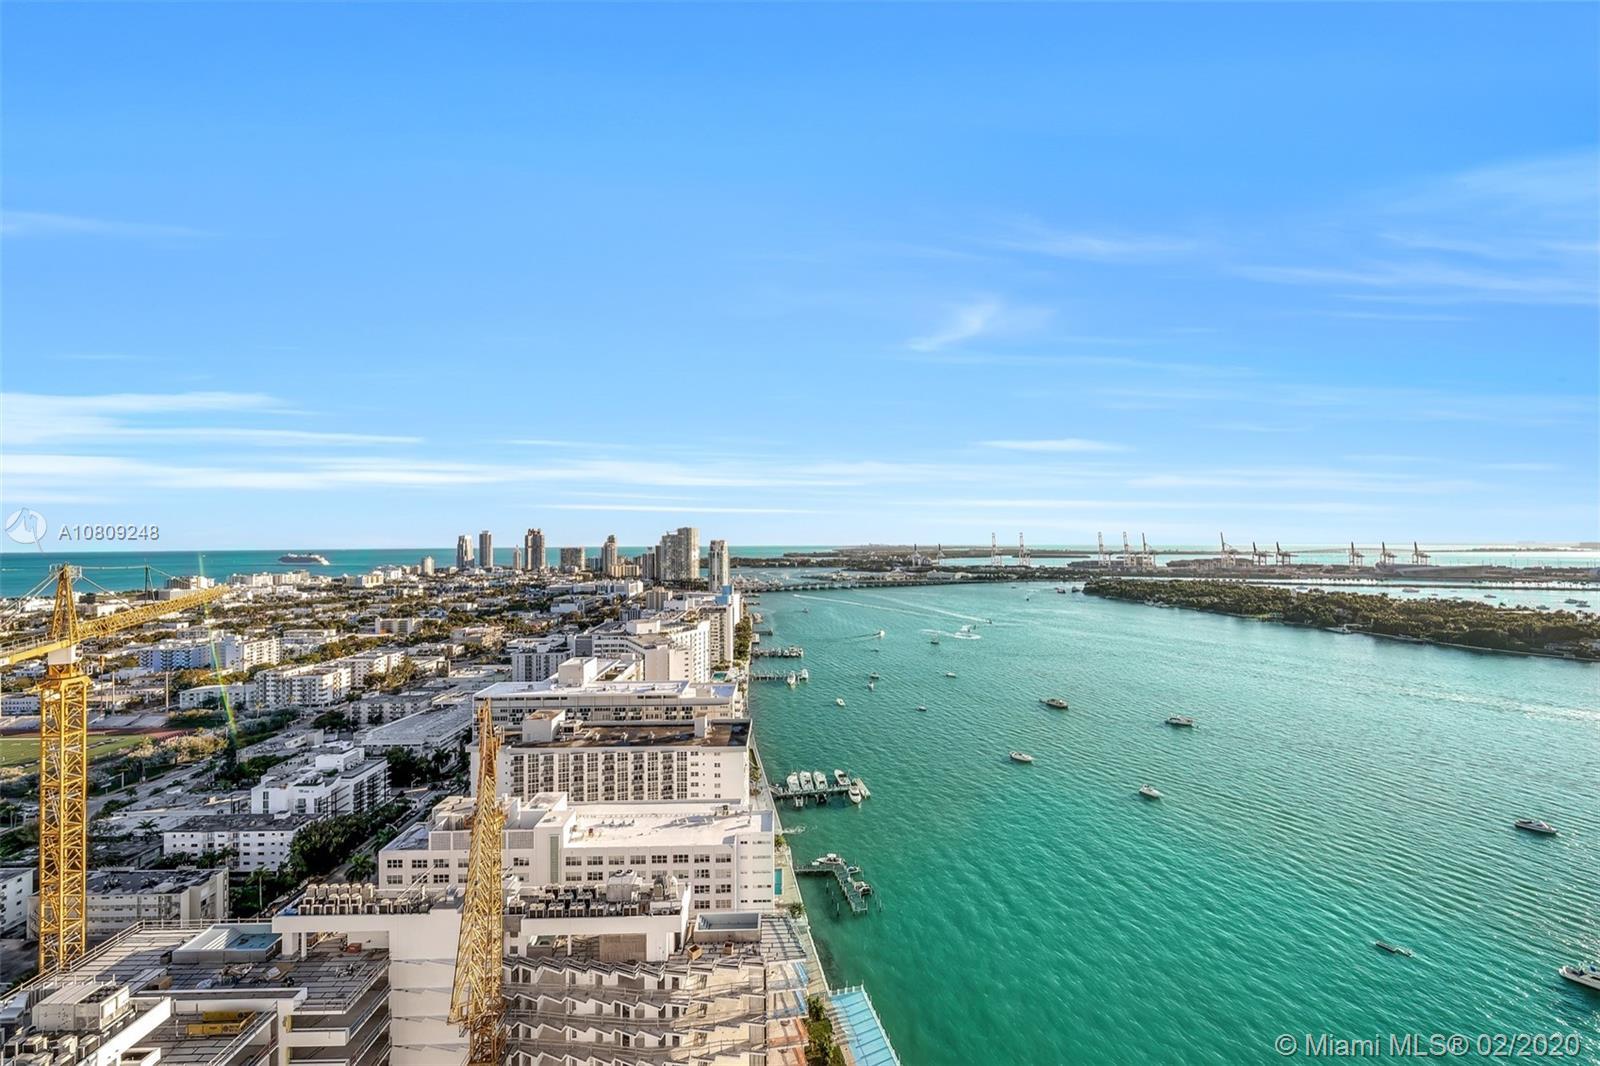 1330 West Ave, 3504 - Miami Beach, Florida